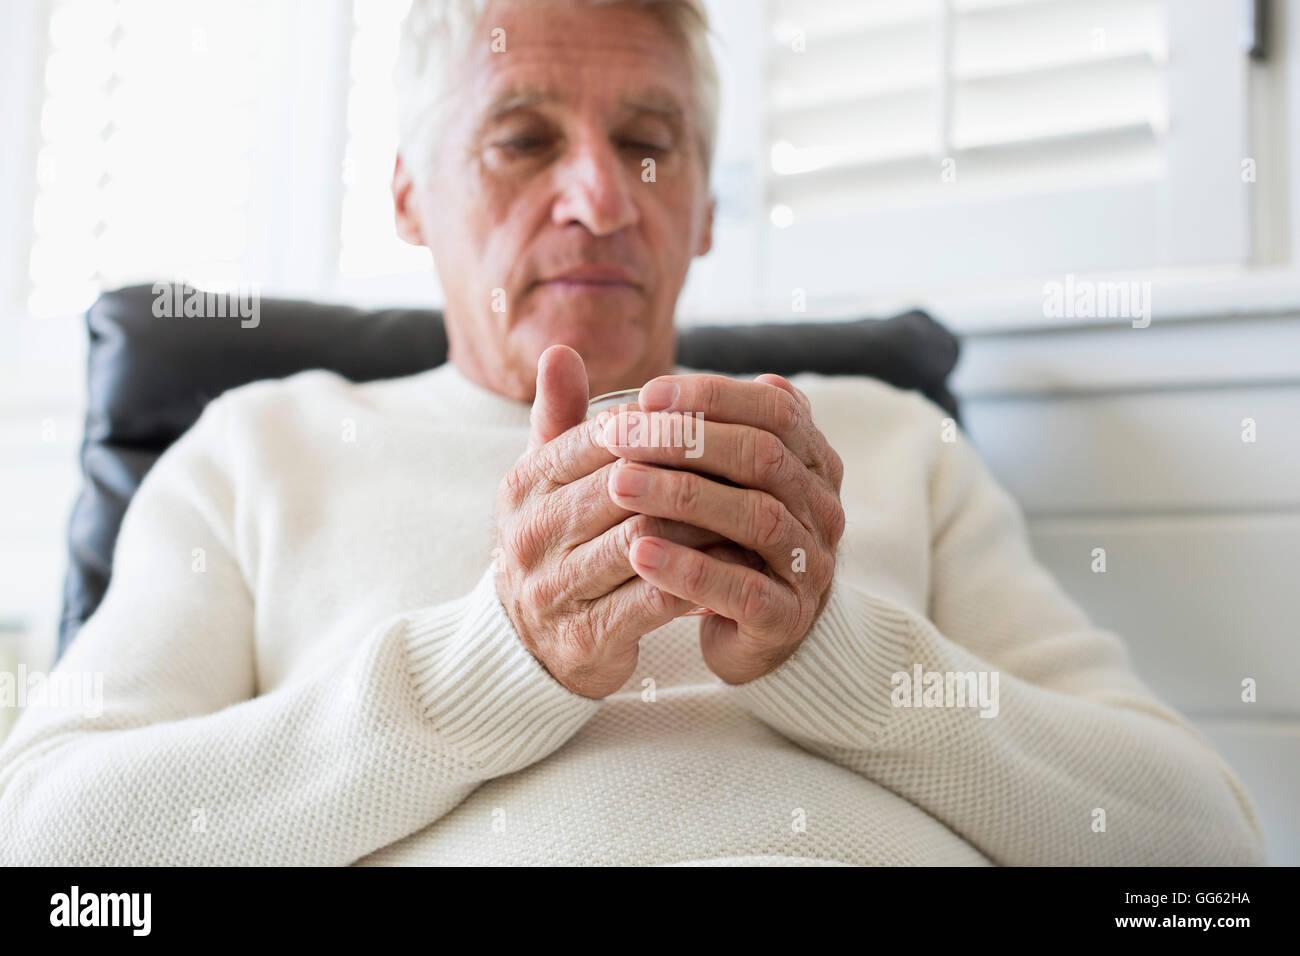 Senior man holding a cup of tea Photo Stock